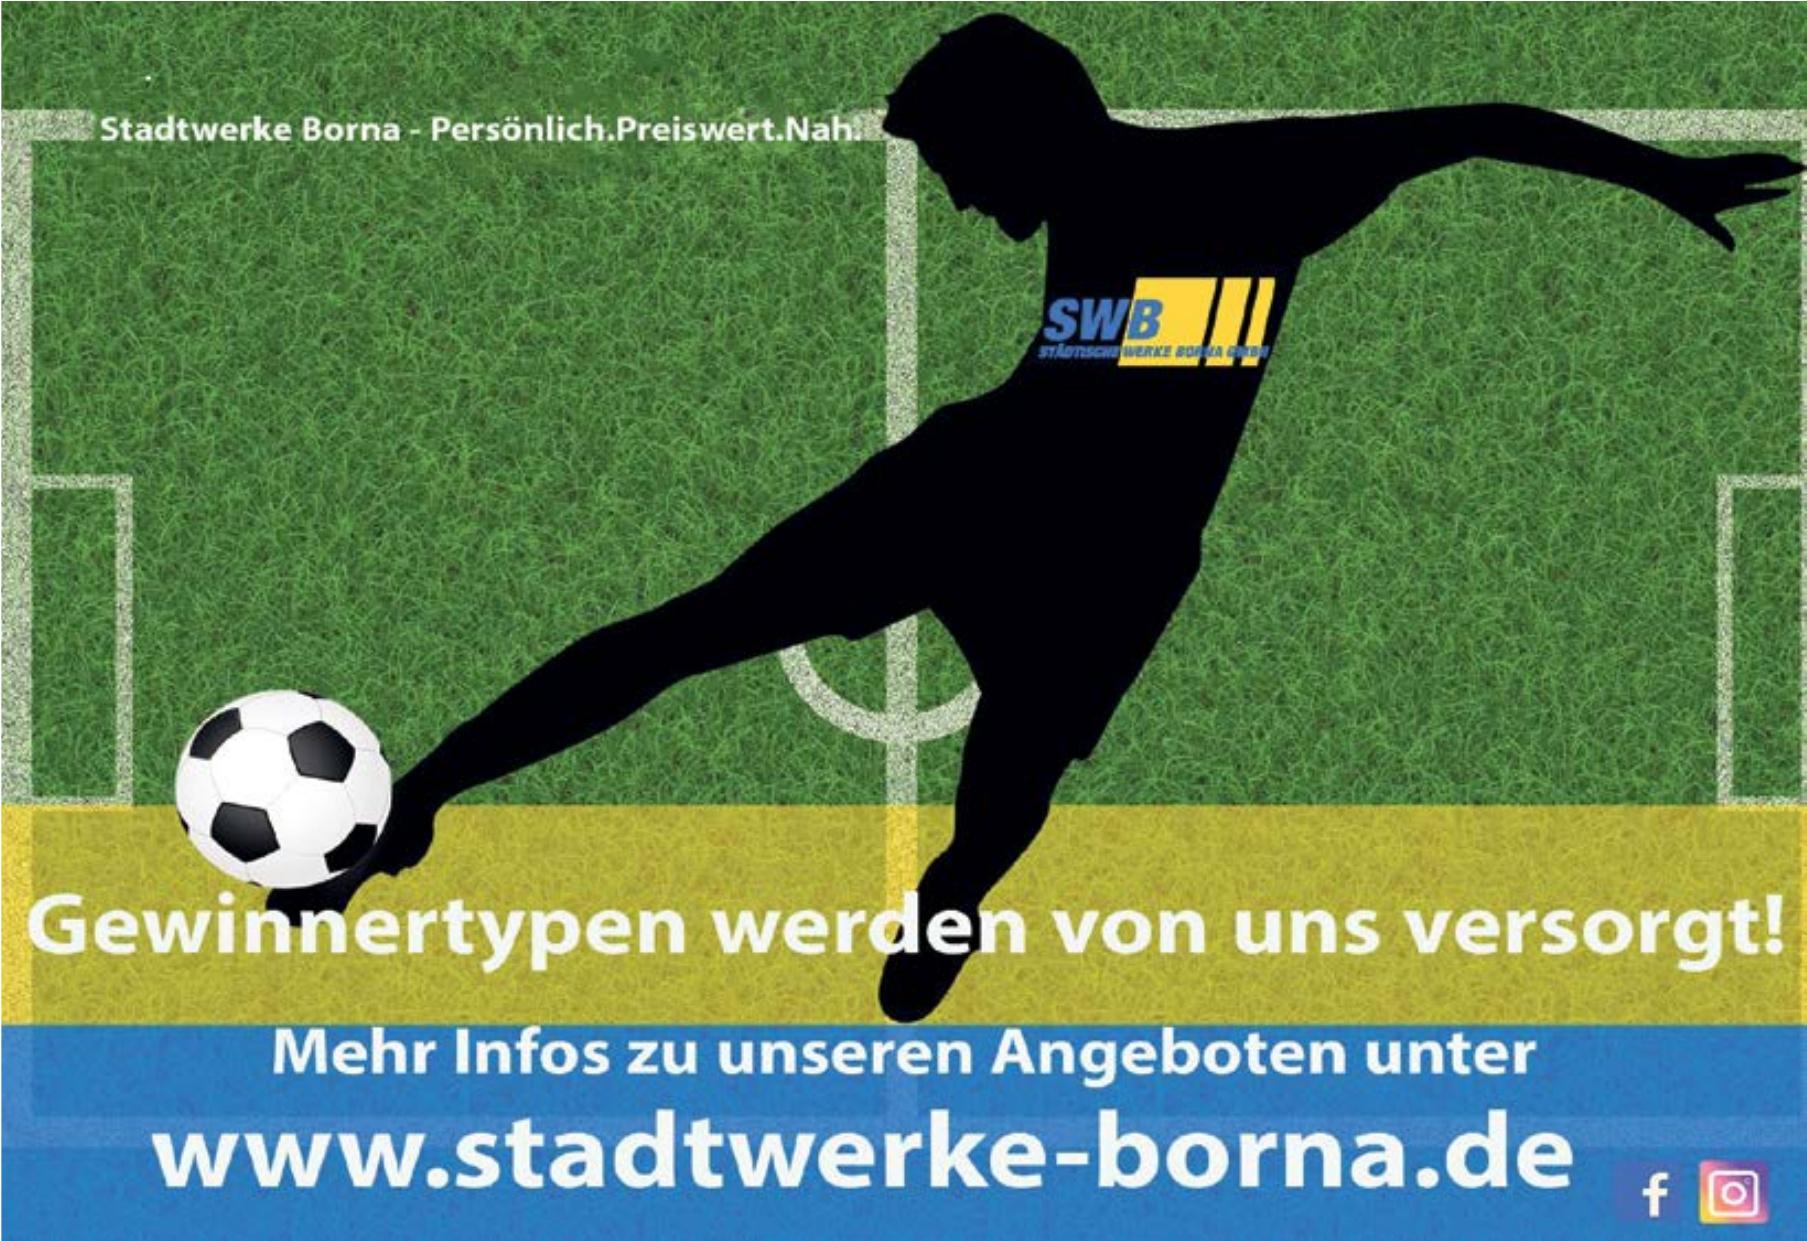 Stadtwerke Borna